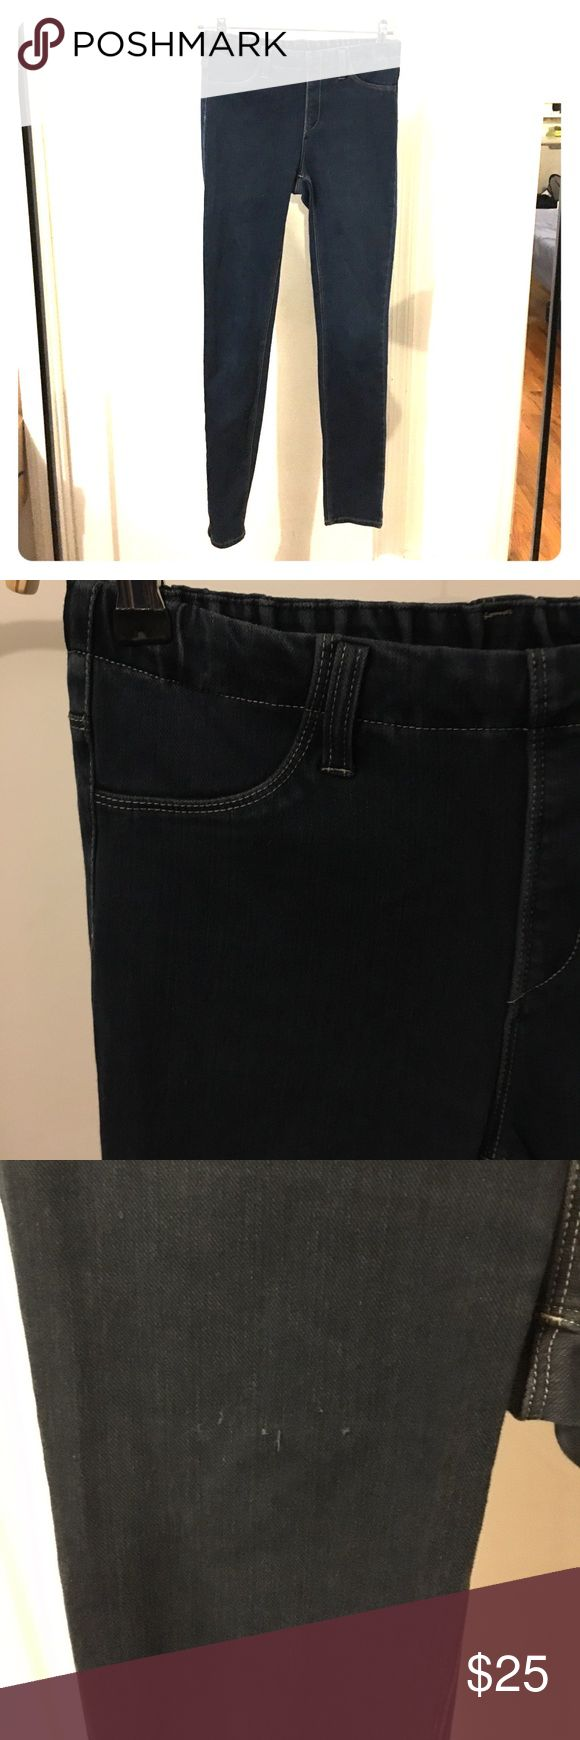 Uniqlo Stretch Jeans Jeggings Leggings medium M Comfy Jean leggings. Size : medium. Some wear on leg (loose thread). Uniqlo Jeans Skinny